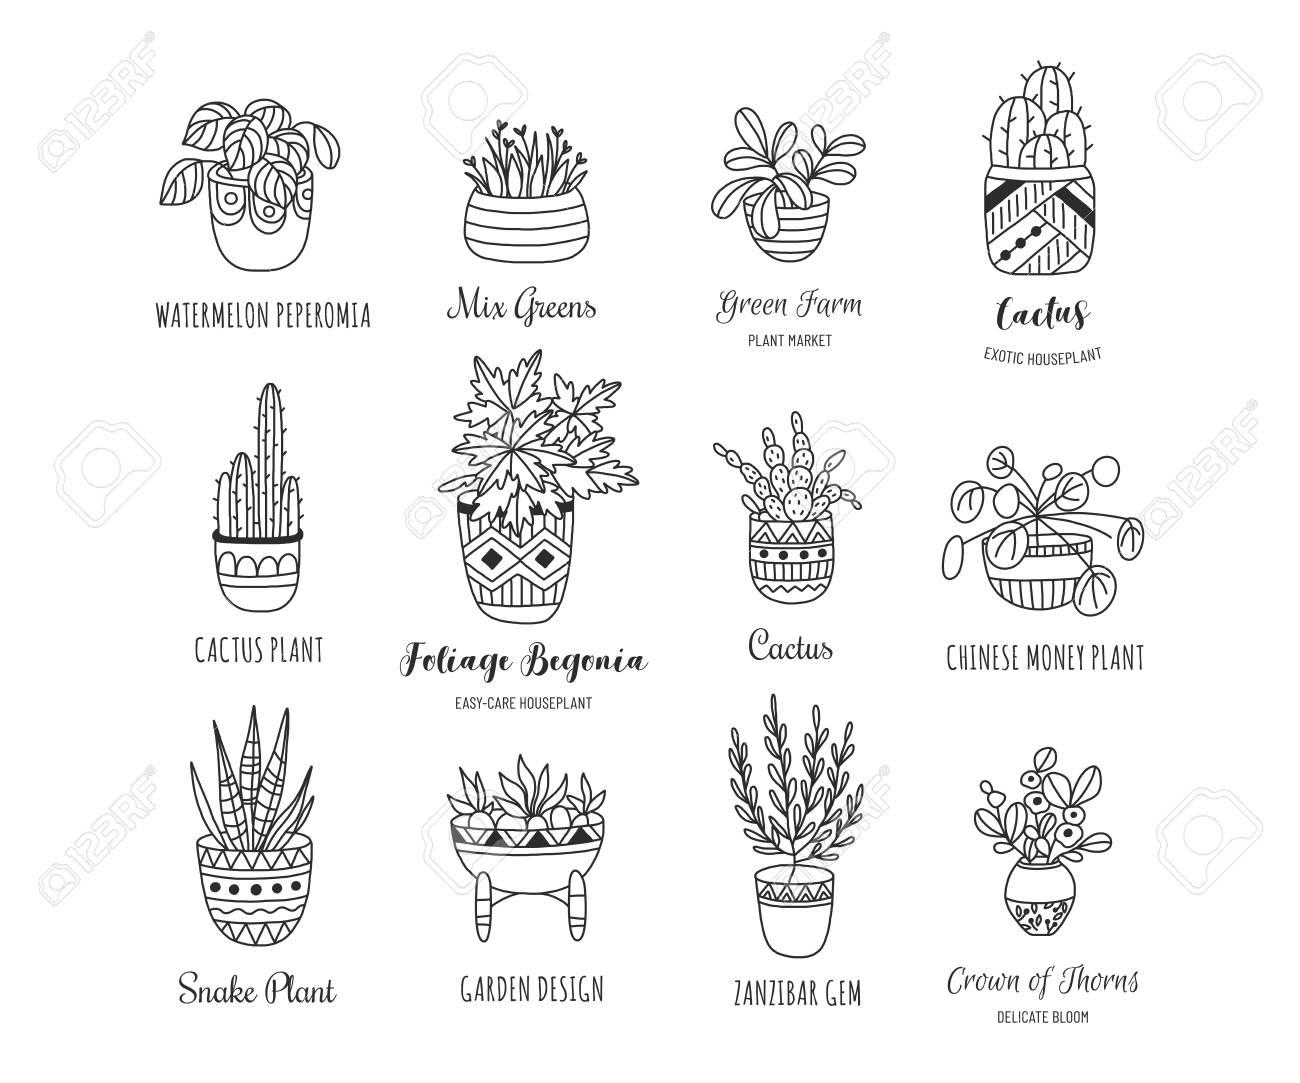 House Plants Hand Drawn Illustration Set Simple Elegant Modern Royalty Free Cliparts Vectors And Stock Illustration Image 117278979